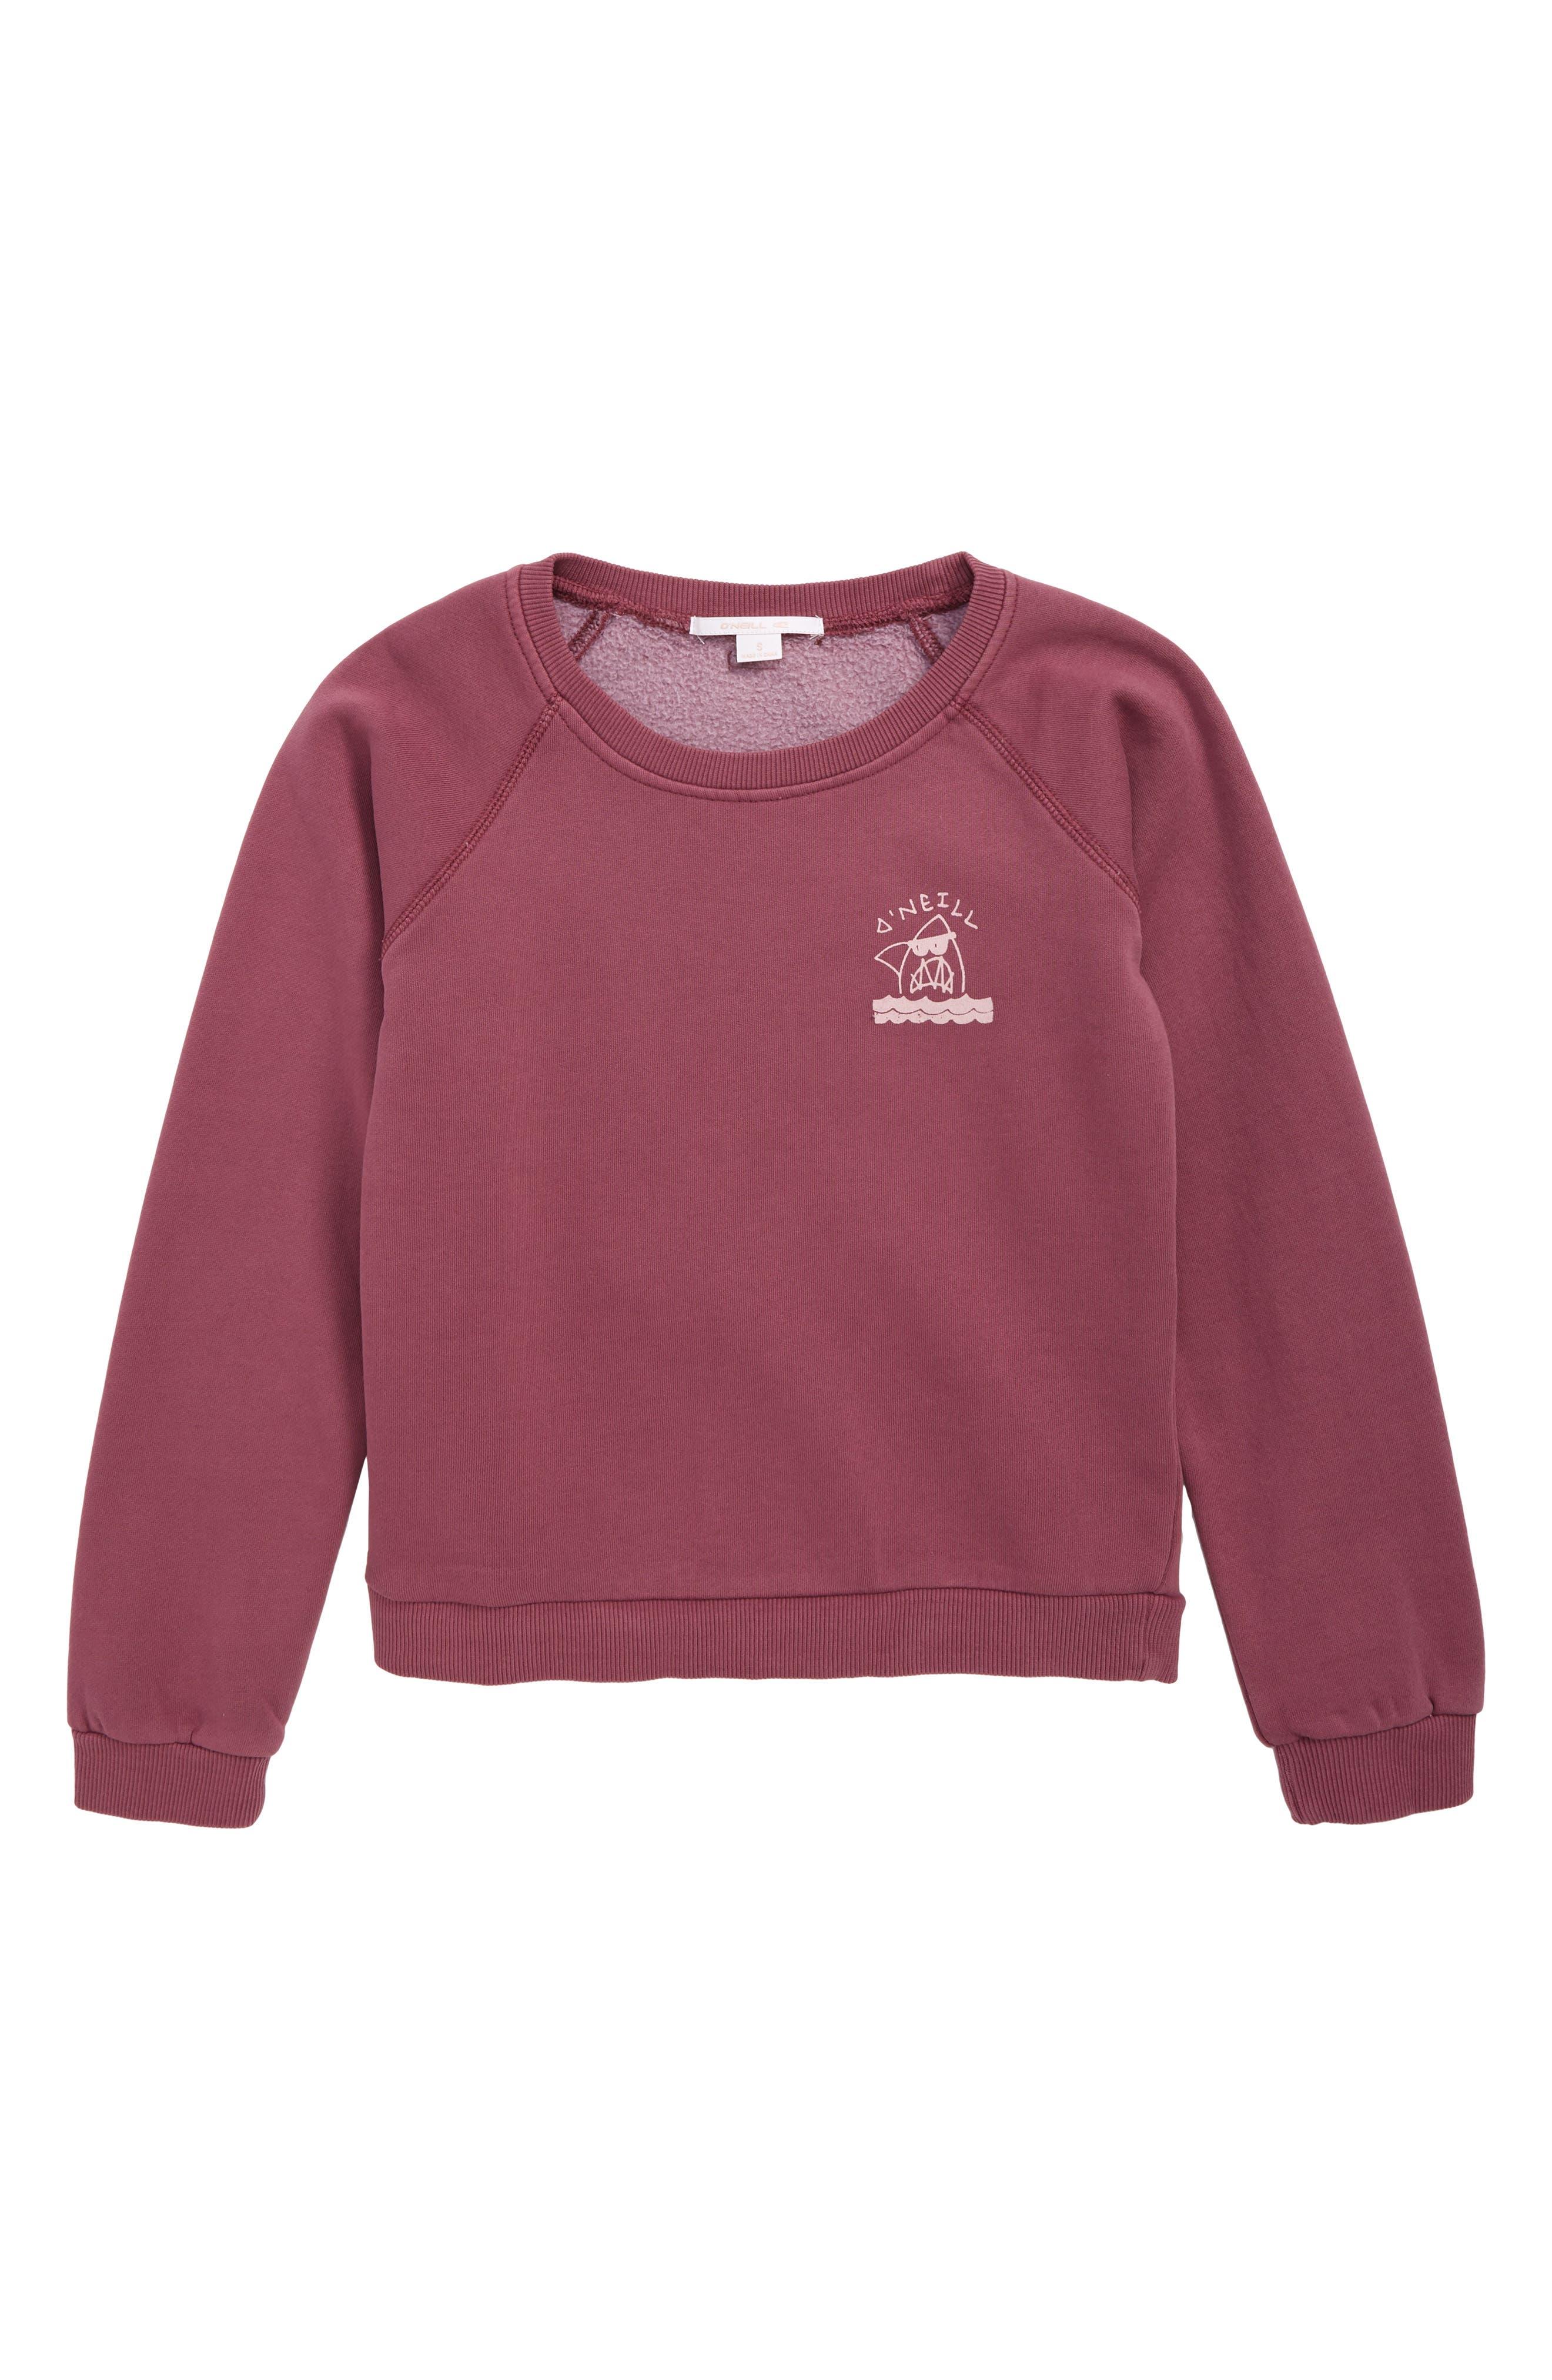 Girls ONeill Logo Graphic Sweatshirt Size L (1214)  Purple